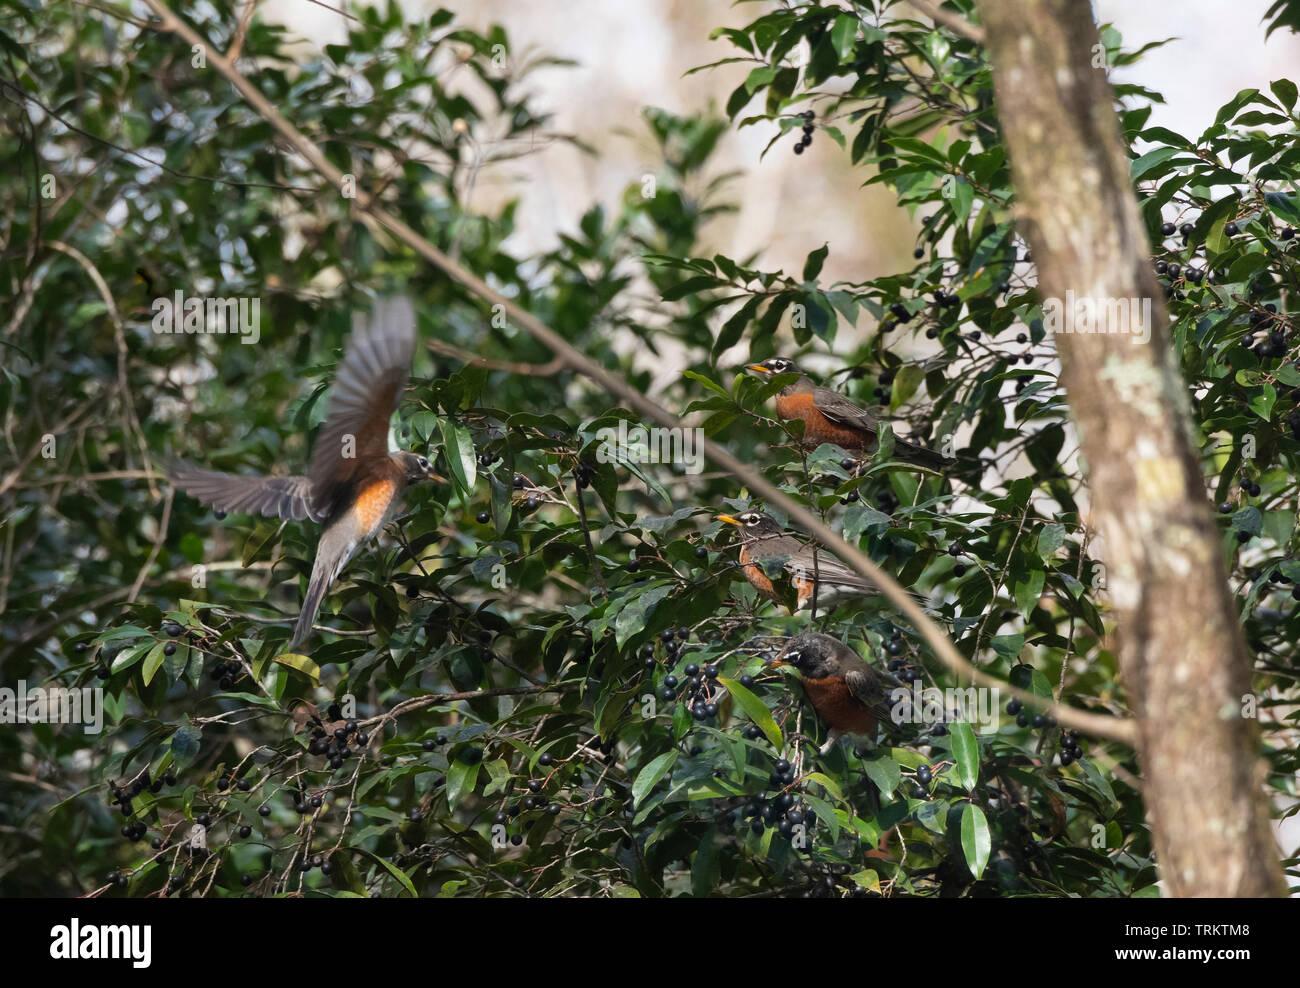 Flock of migrating Robin birds feeding on laurel cherry berries - Stock Image